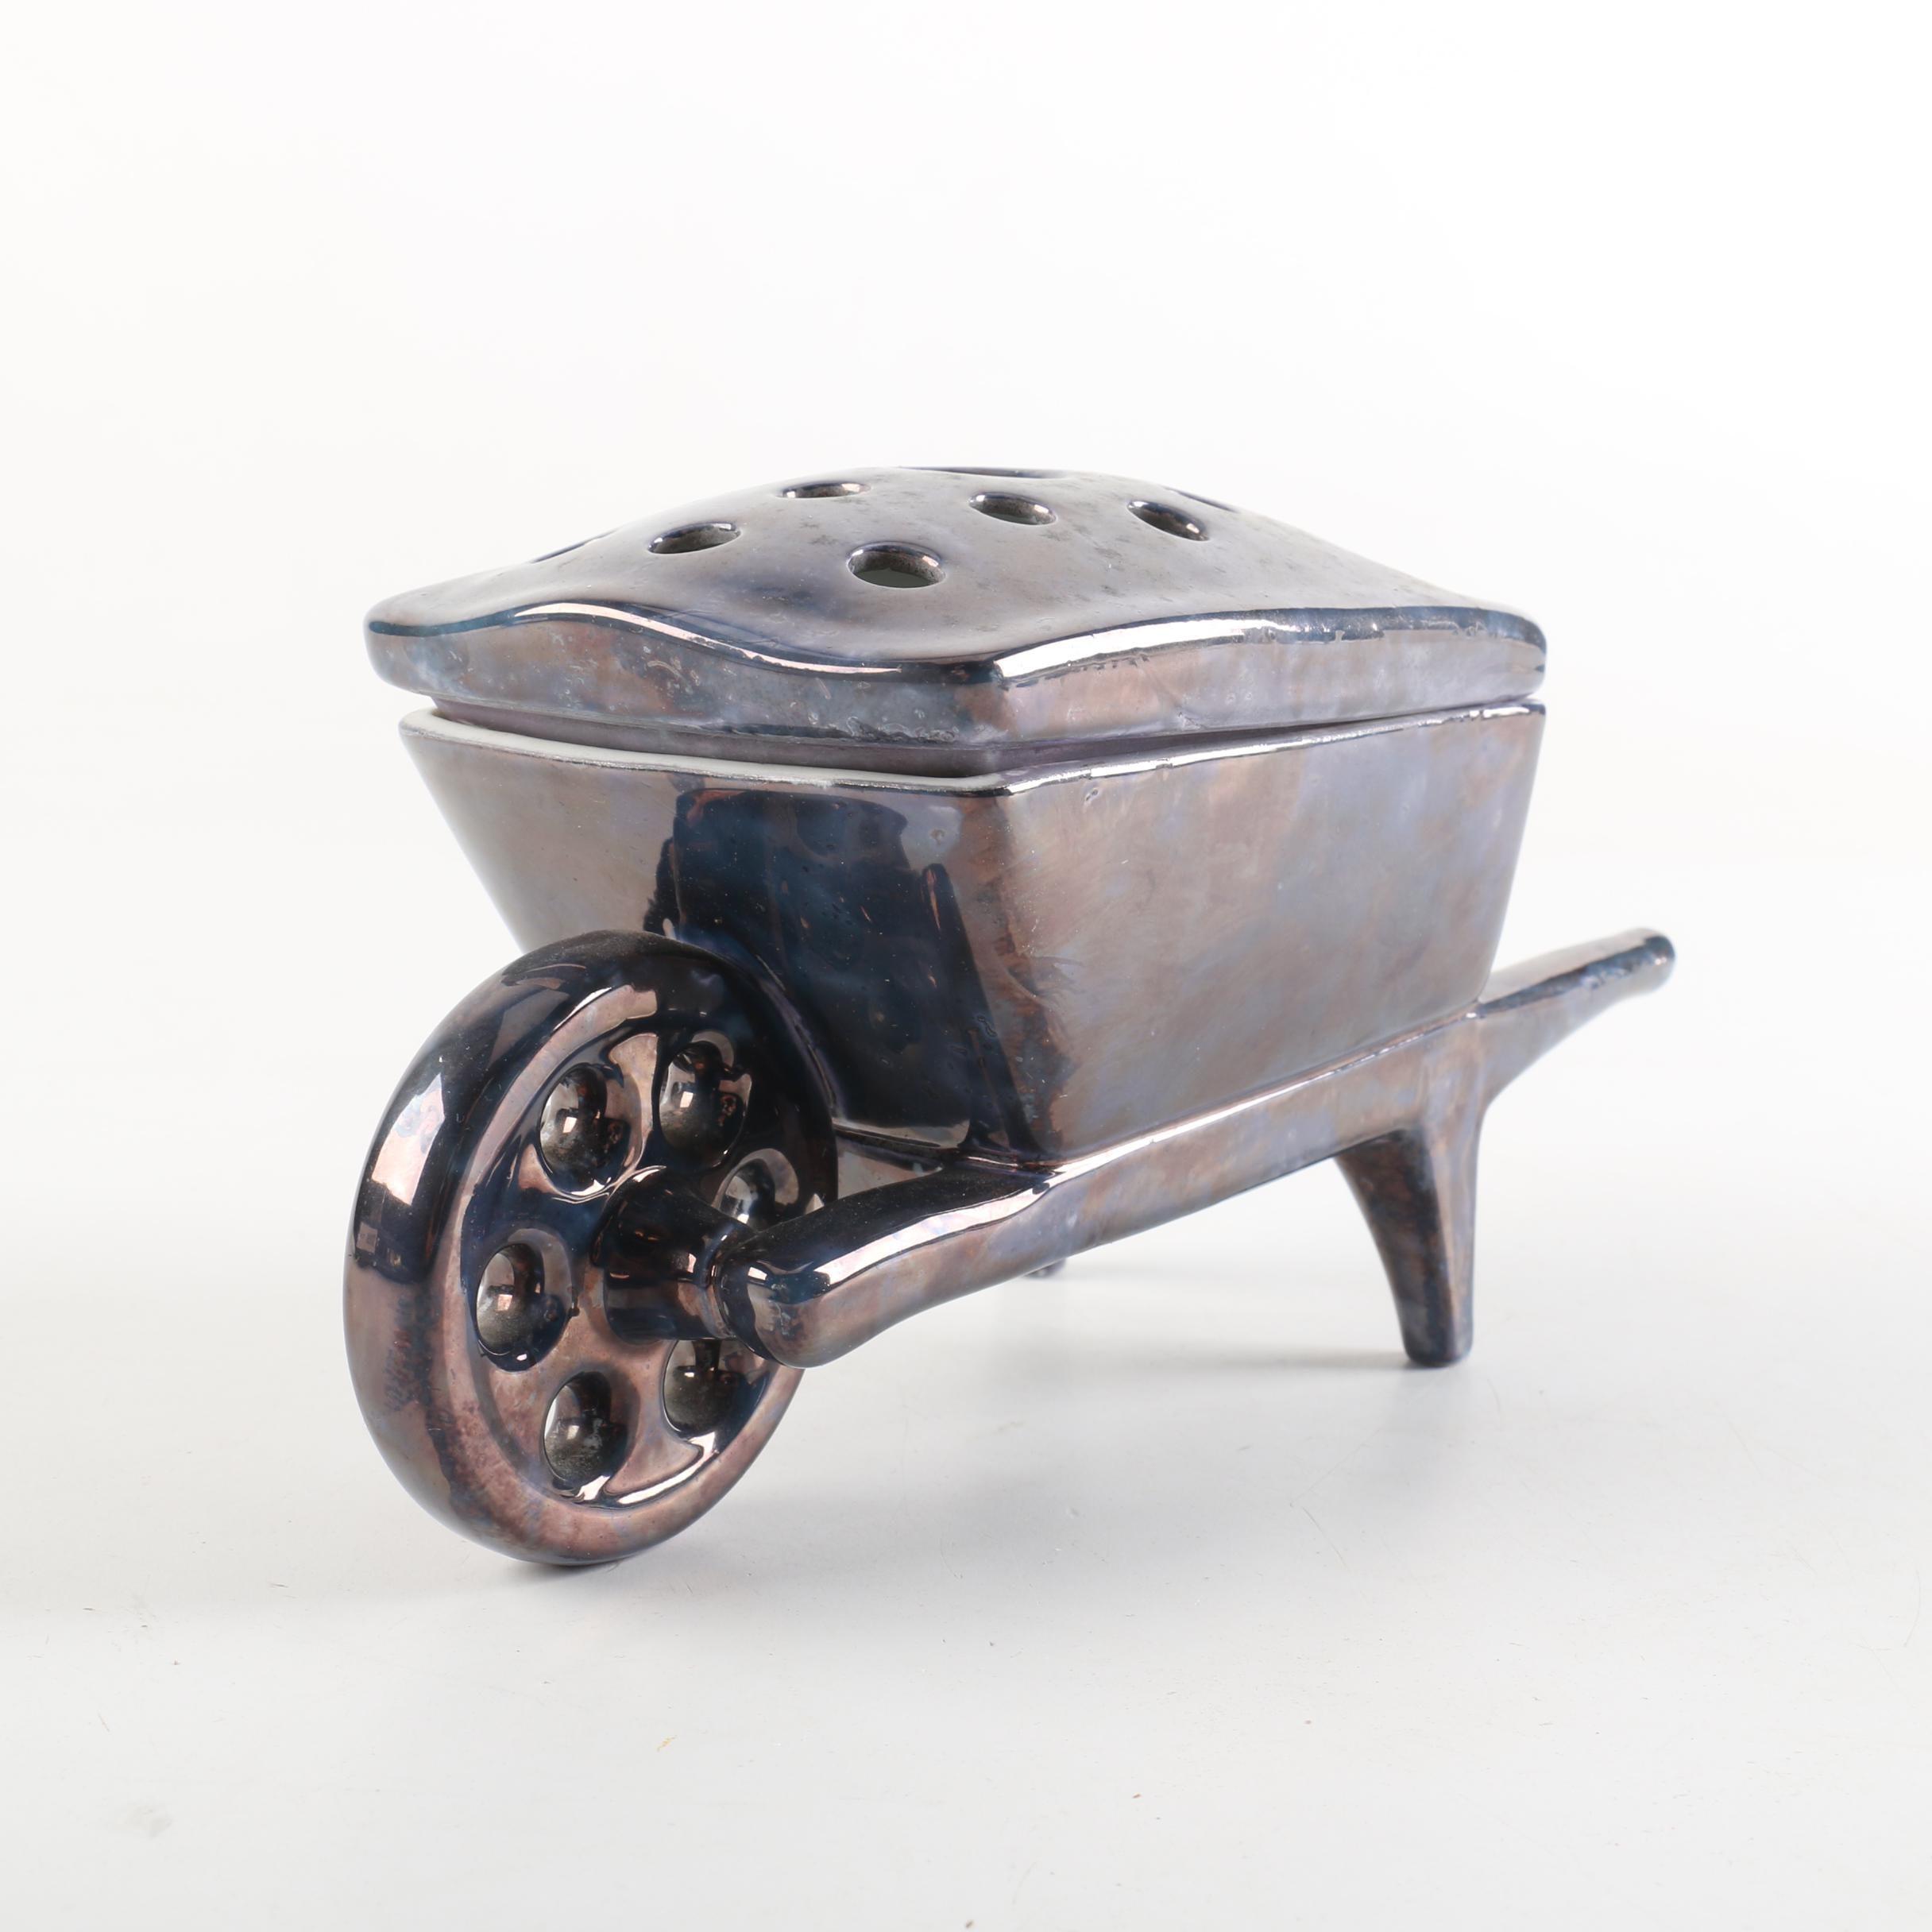 Wagon Shaped Ceramic Flower Frog